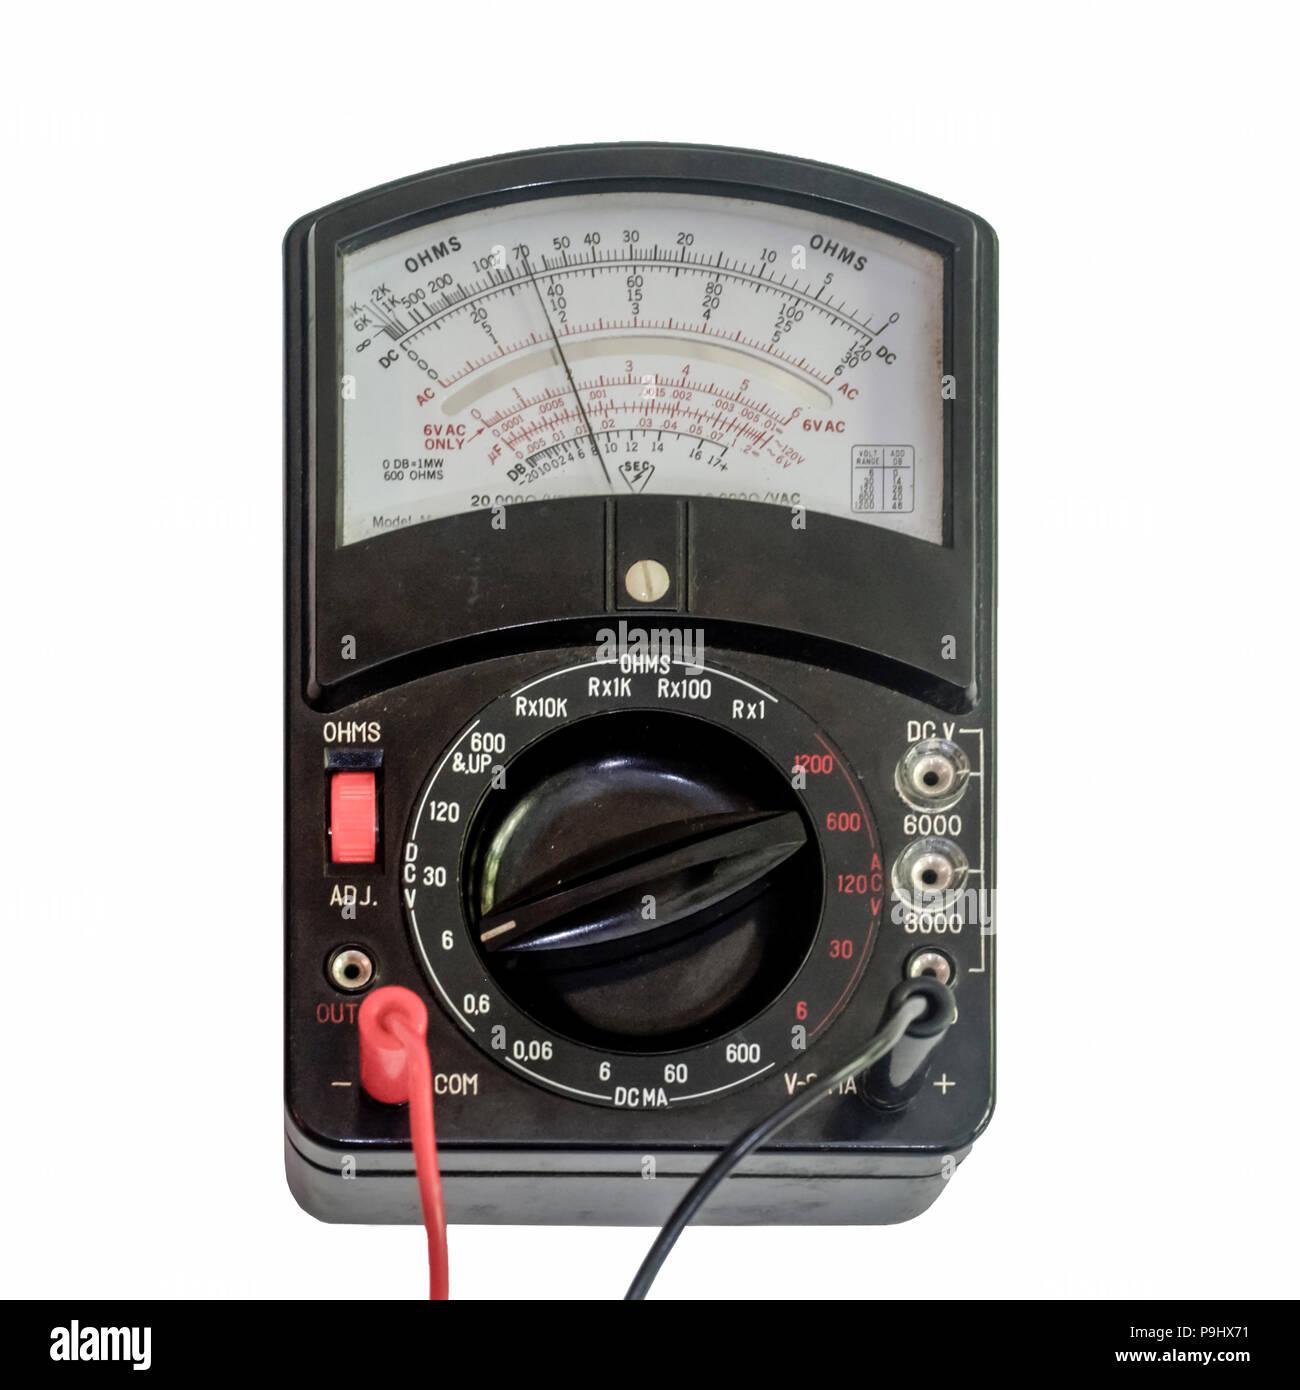 analog multimeter being used as a voltmeter stock photo 212450085analog multimeter being used as a voltmeter